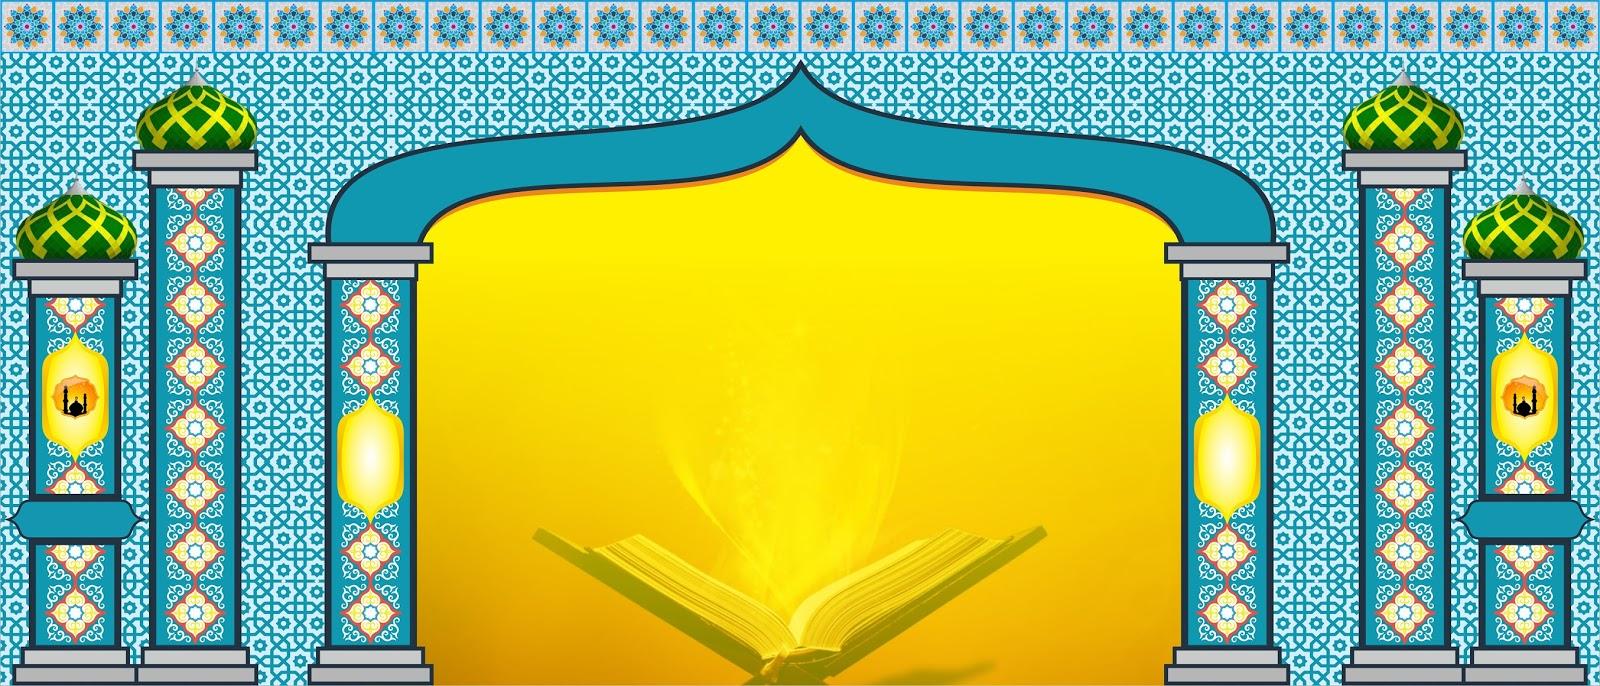 Download Desain Backdrop Islami Format Vektor Cdr Pandasoft